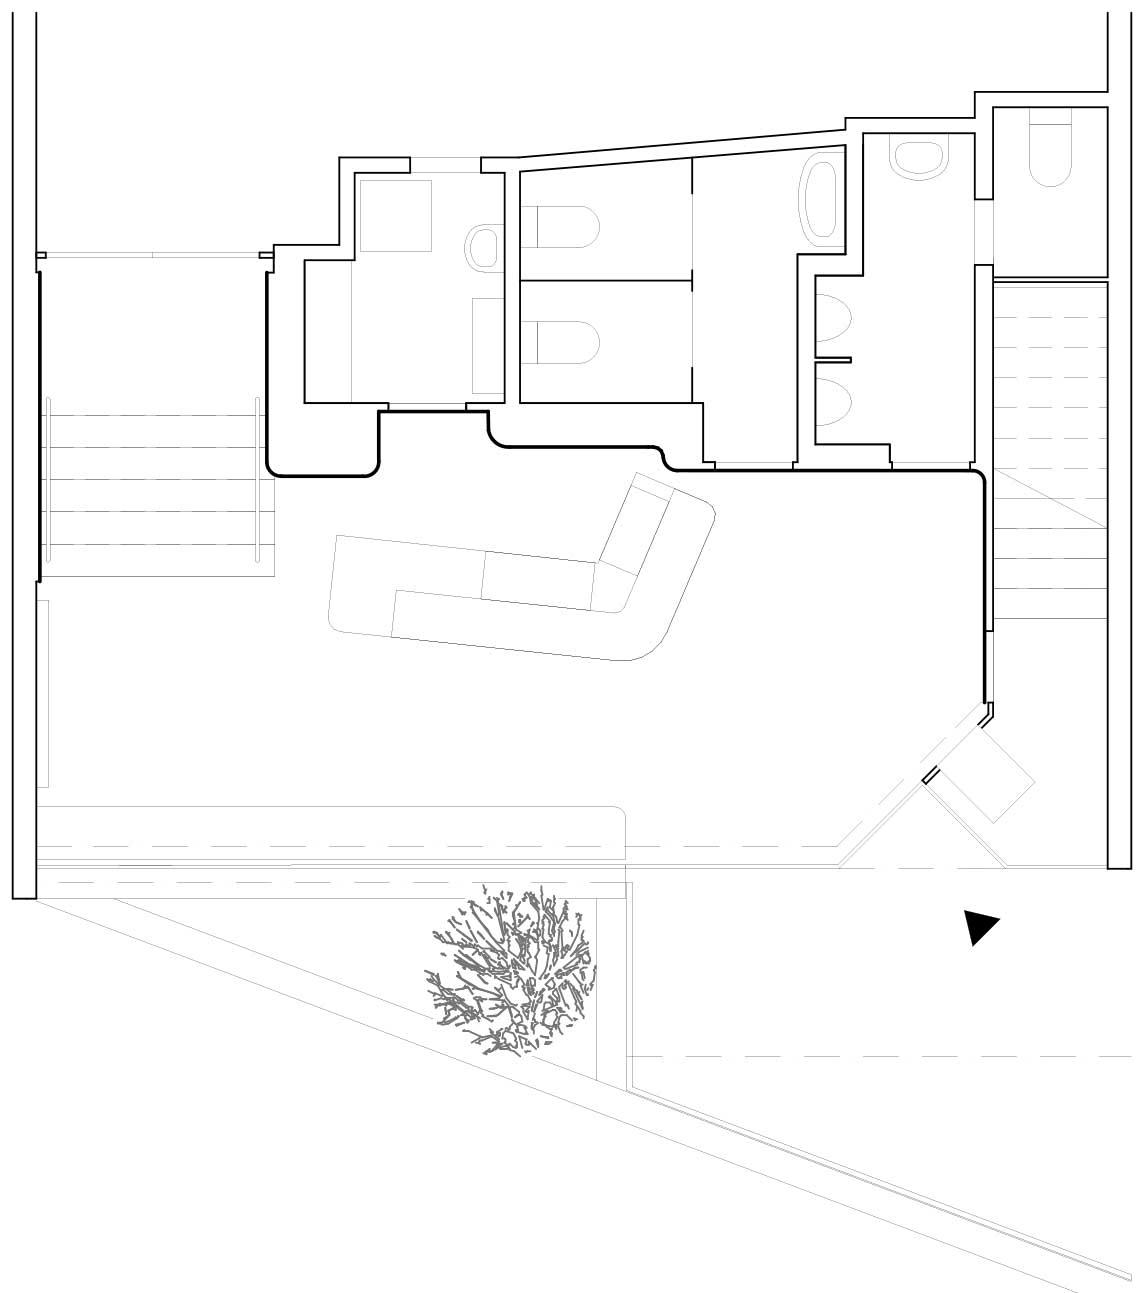 Grundriss Umbau und Sanierung Foyer Kino Camera Bern